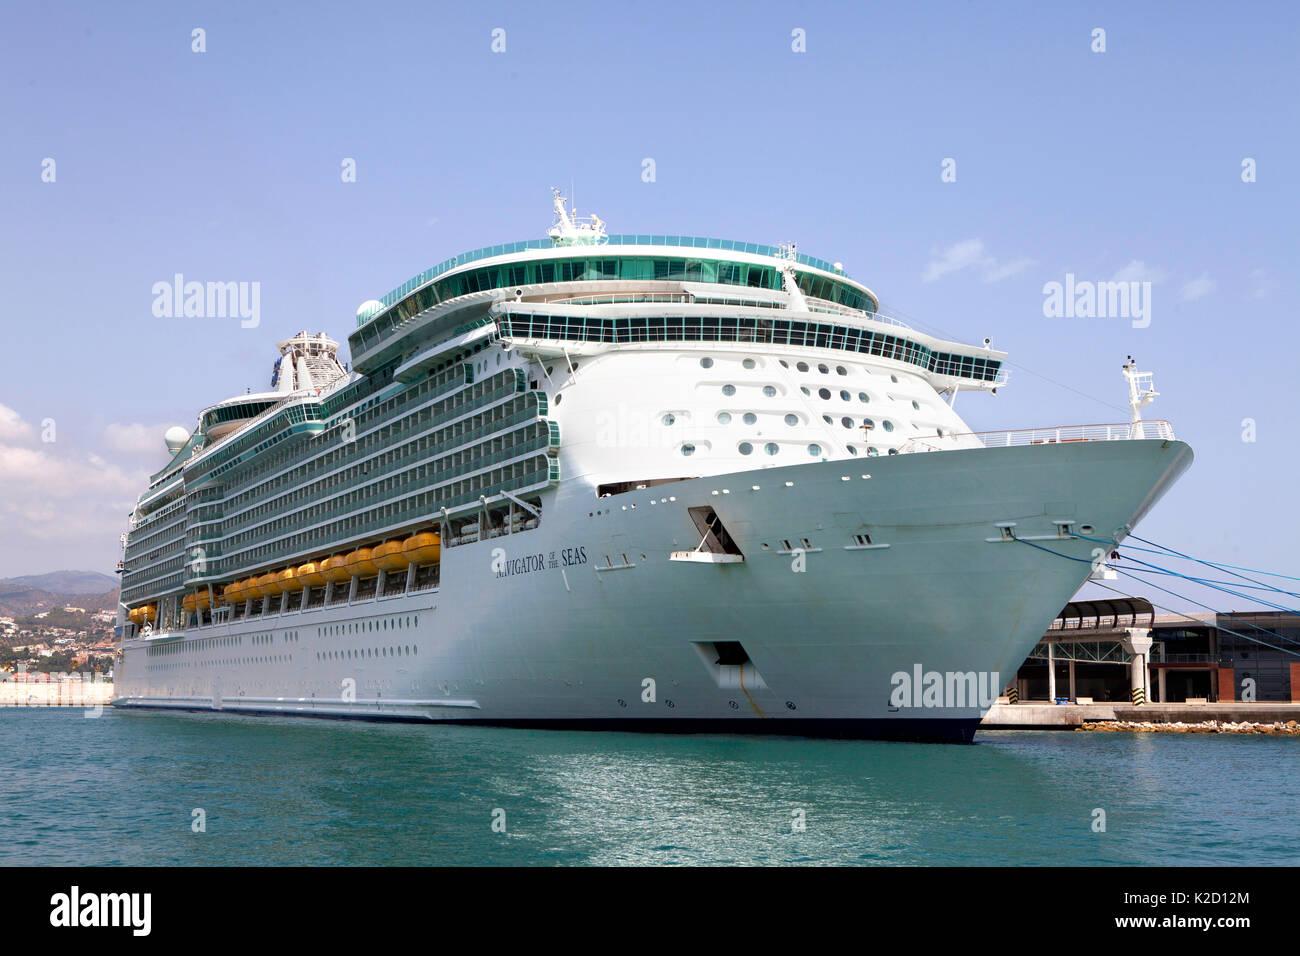 Royal Caribbean Navigator of the Seas, voyager class cruise ship docked at Malaga, Spain in the Mediterranean - Stock Image